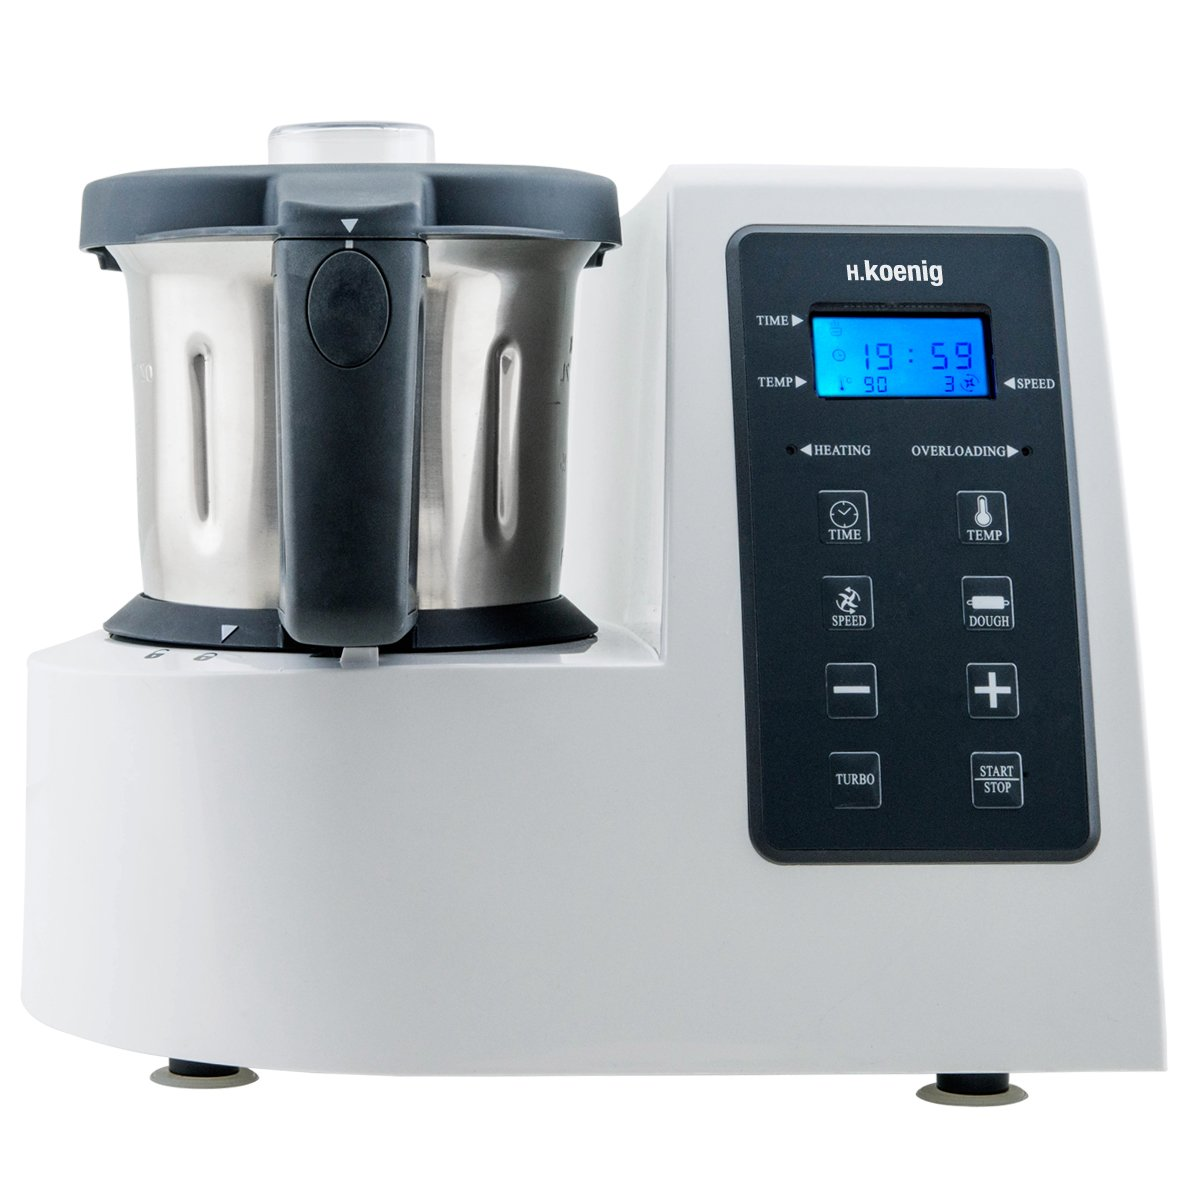 H.Koenig HKM1028 Robot de Cocina Funcion Caliente, 1300 W, 600 W ...